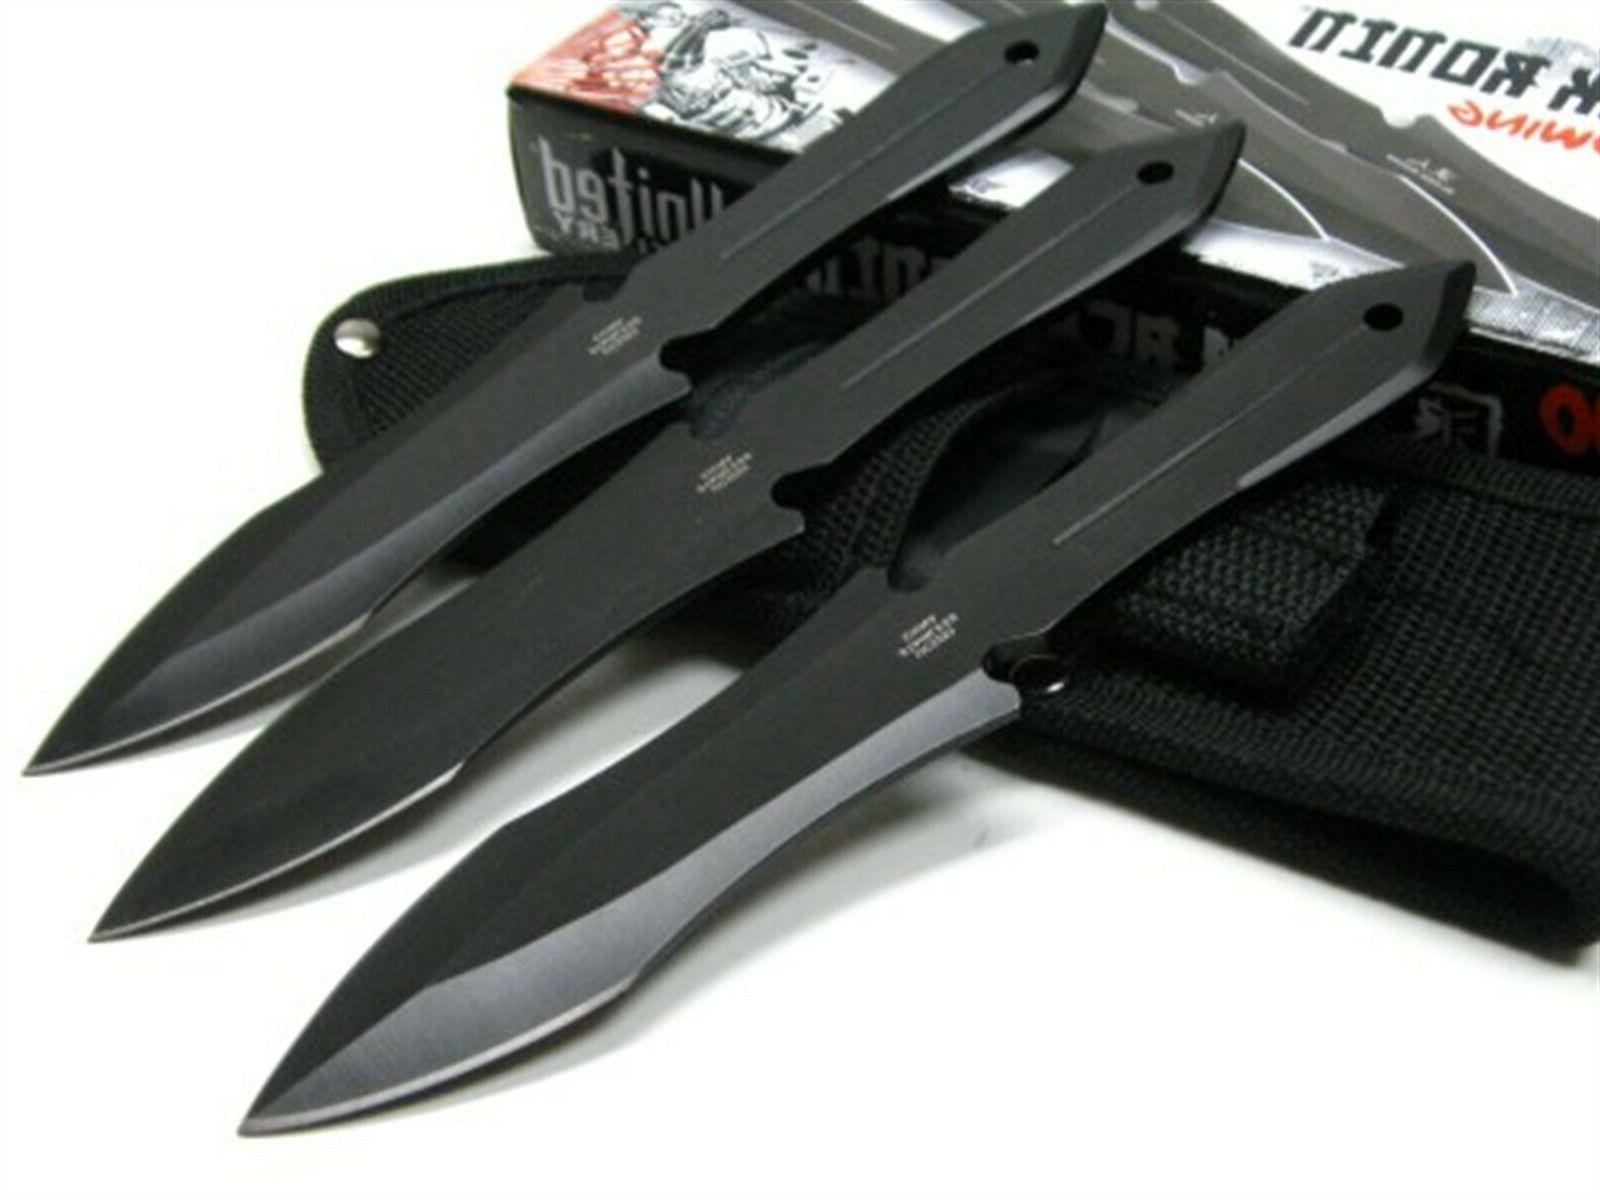 United Ronin 3Cr13 Triple Throwing Boot Knife + Sheath